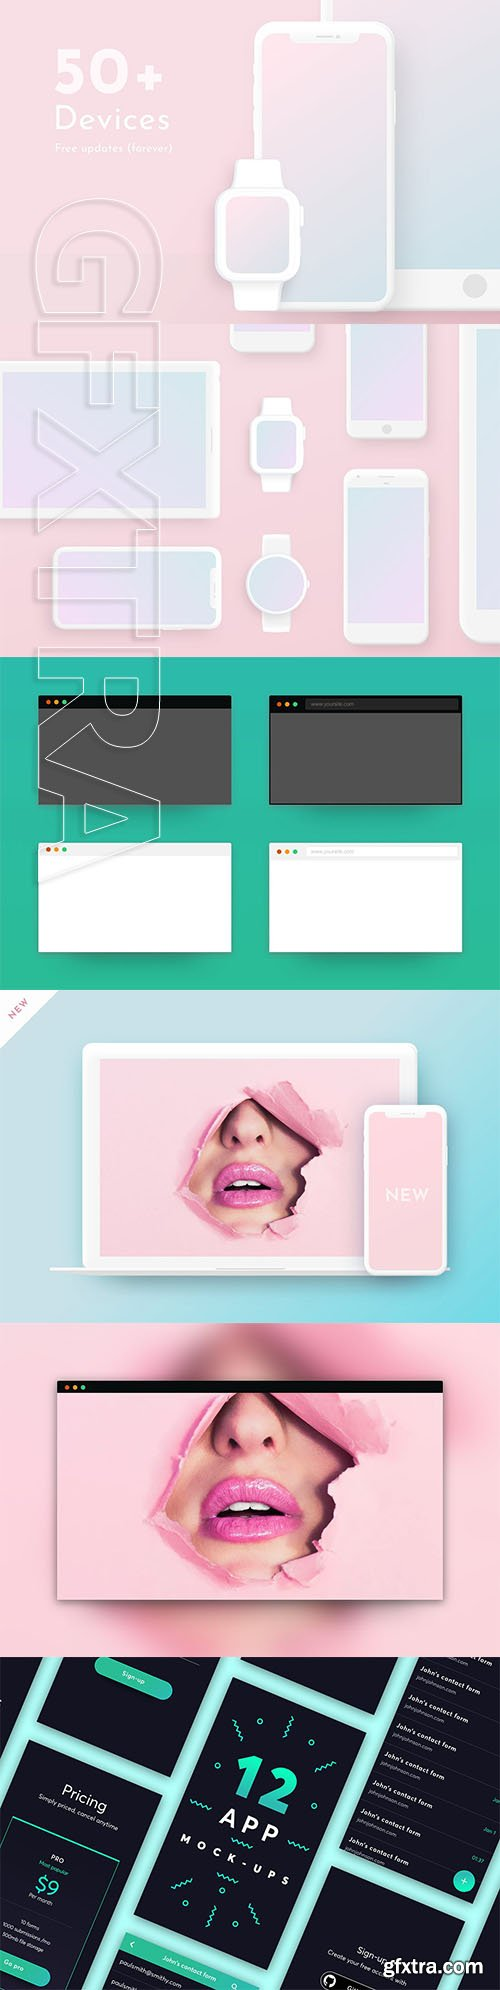 CreativeMarket - All Minimal Mock-ups One bundle 3715679